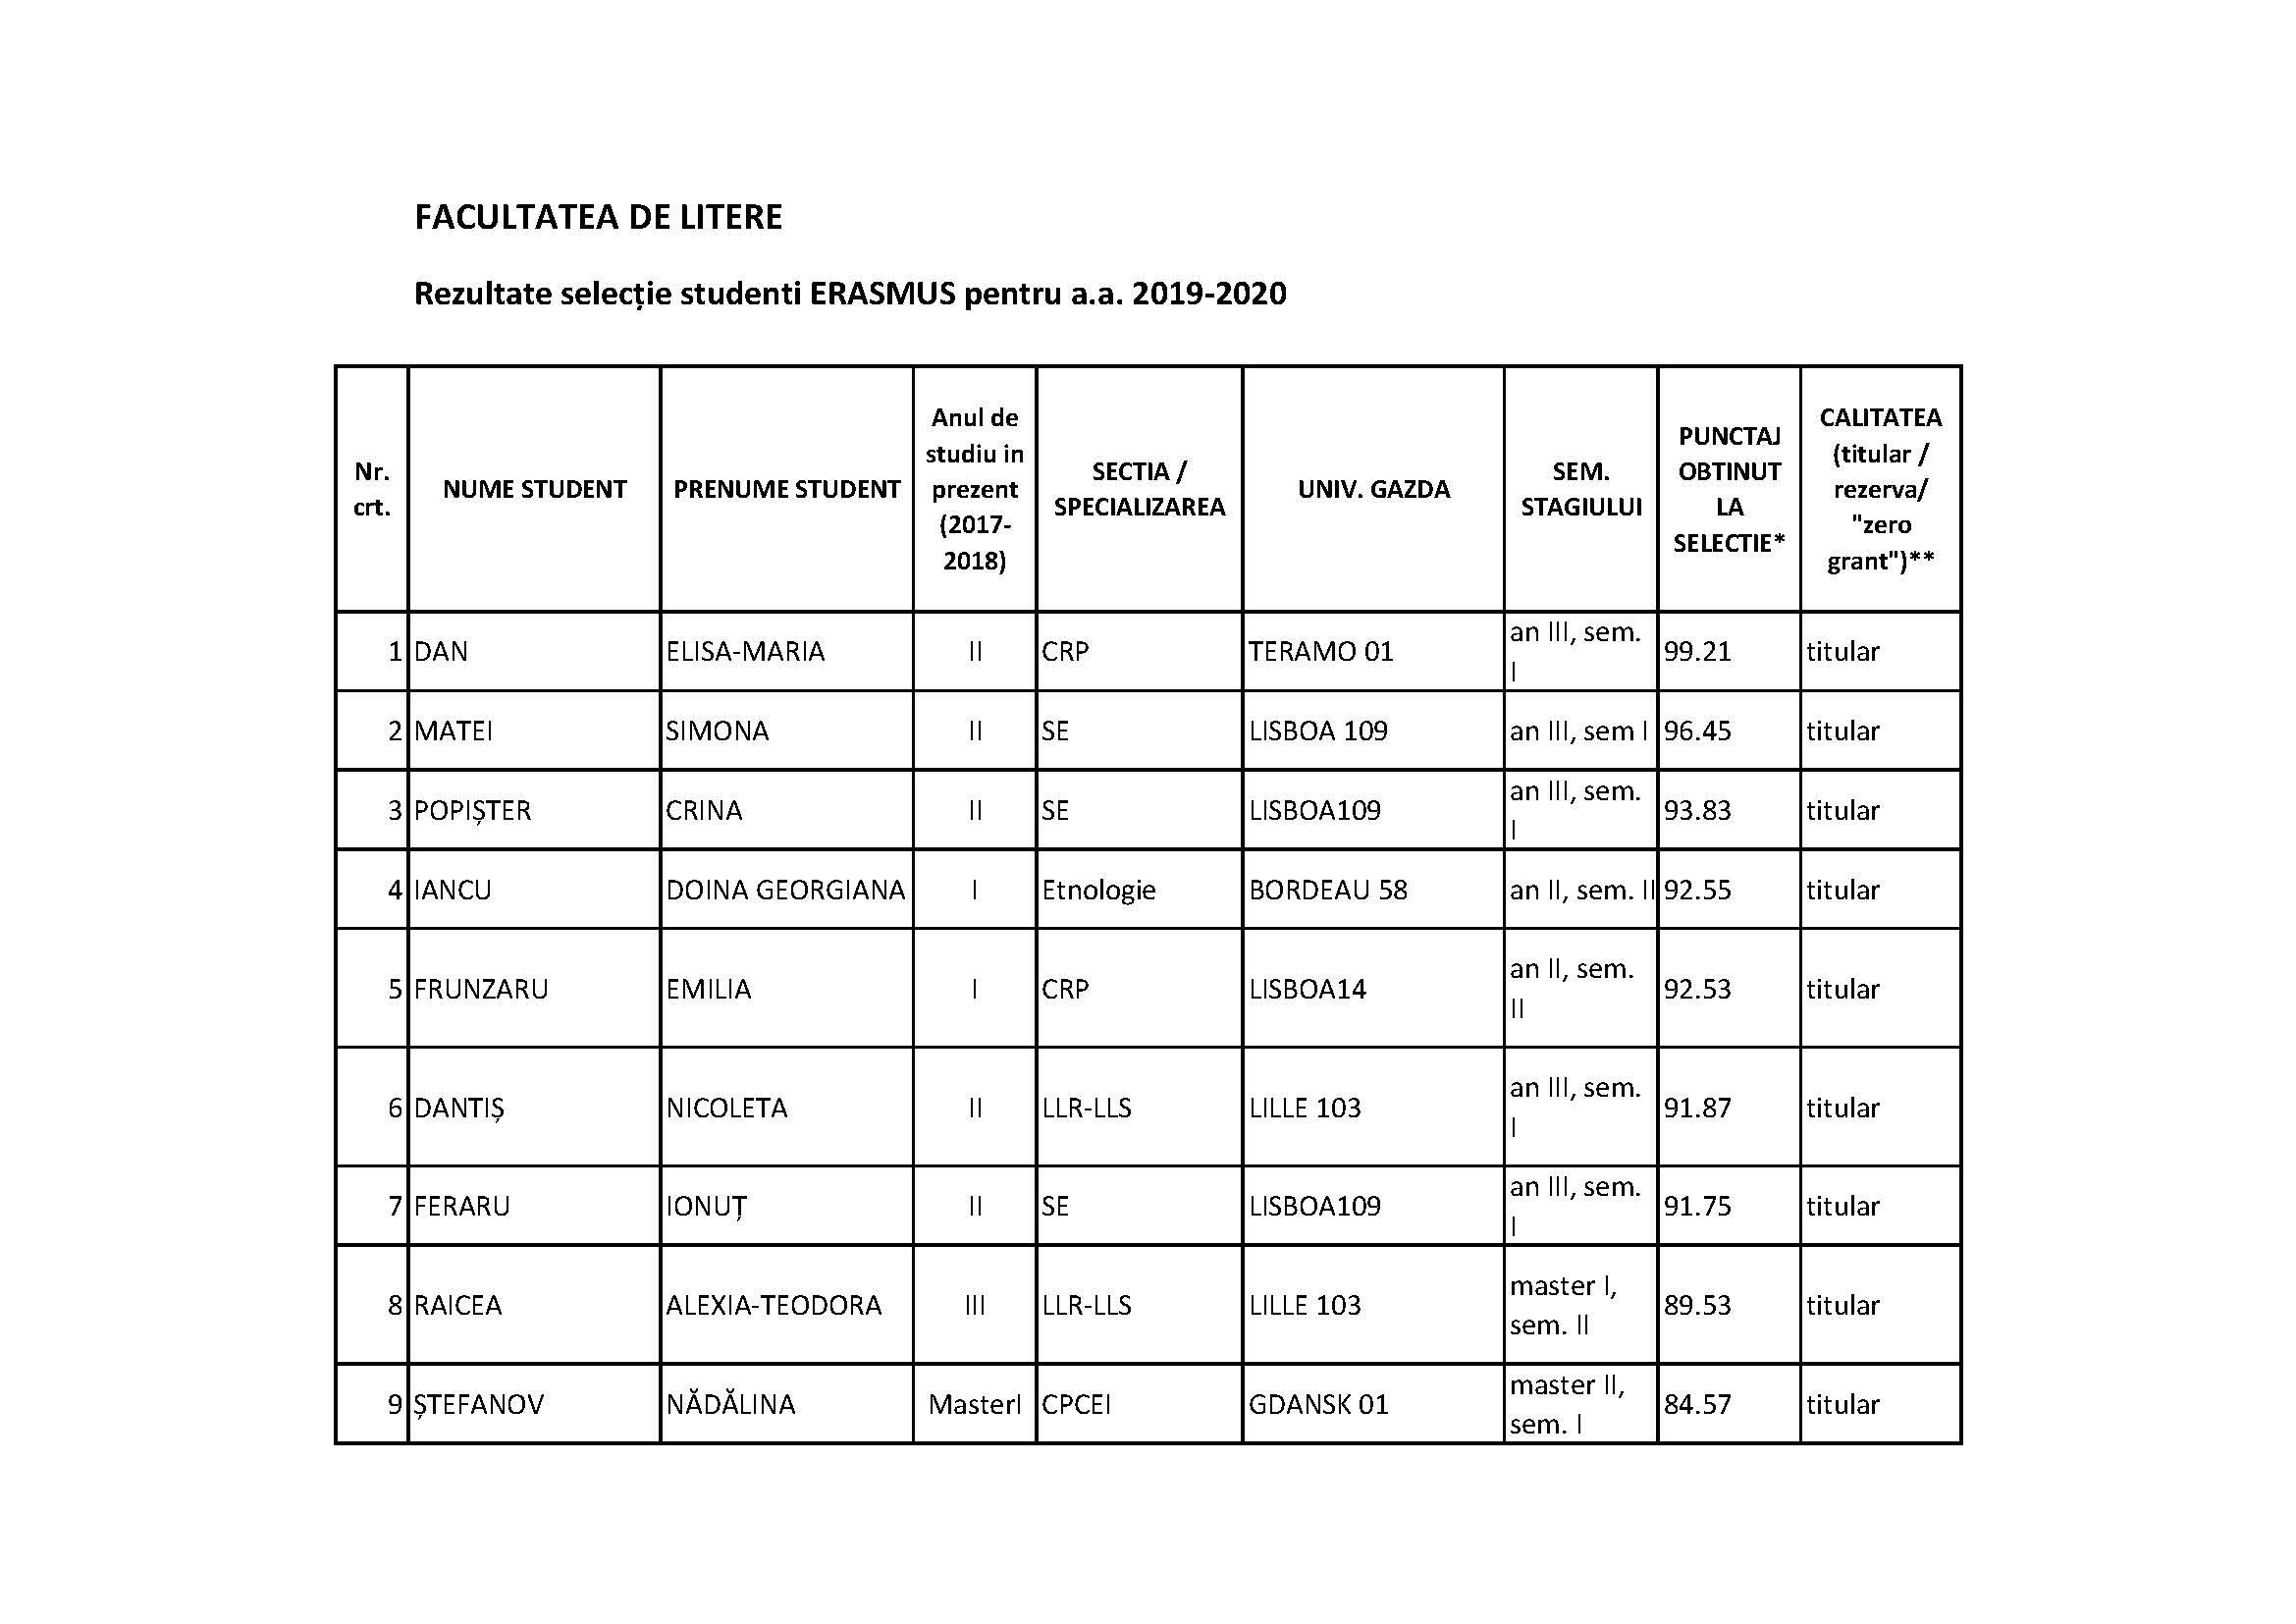 Rezultate selectie studenti bursieri ERASMUS 2019-2020